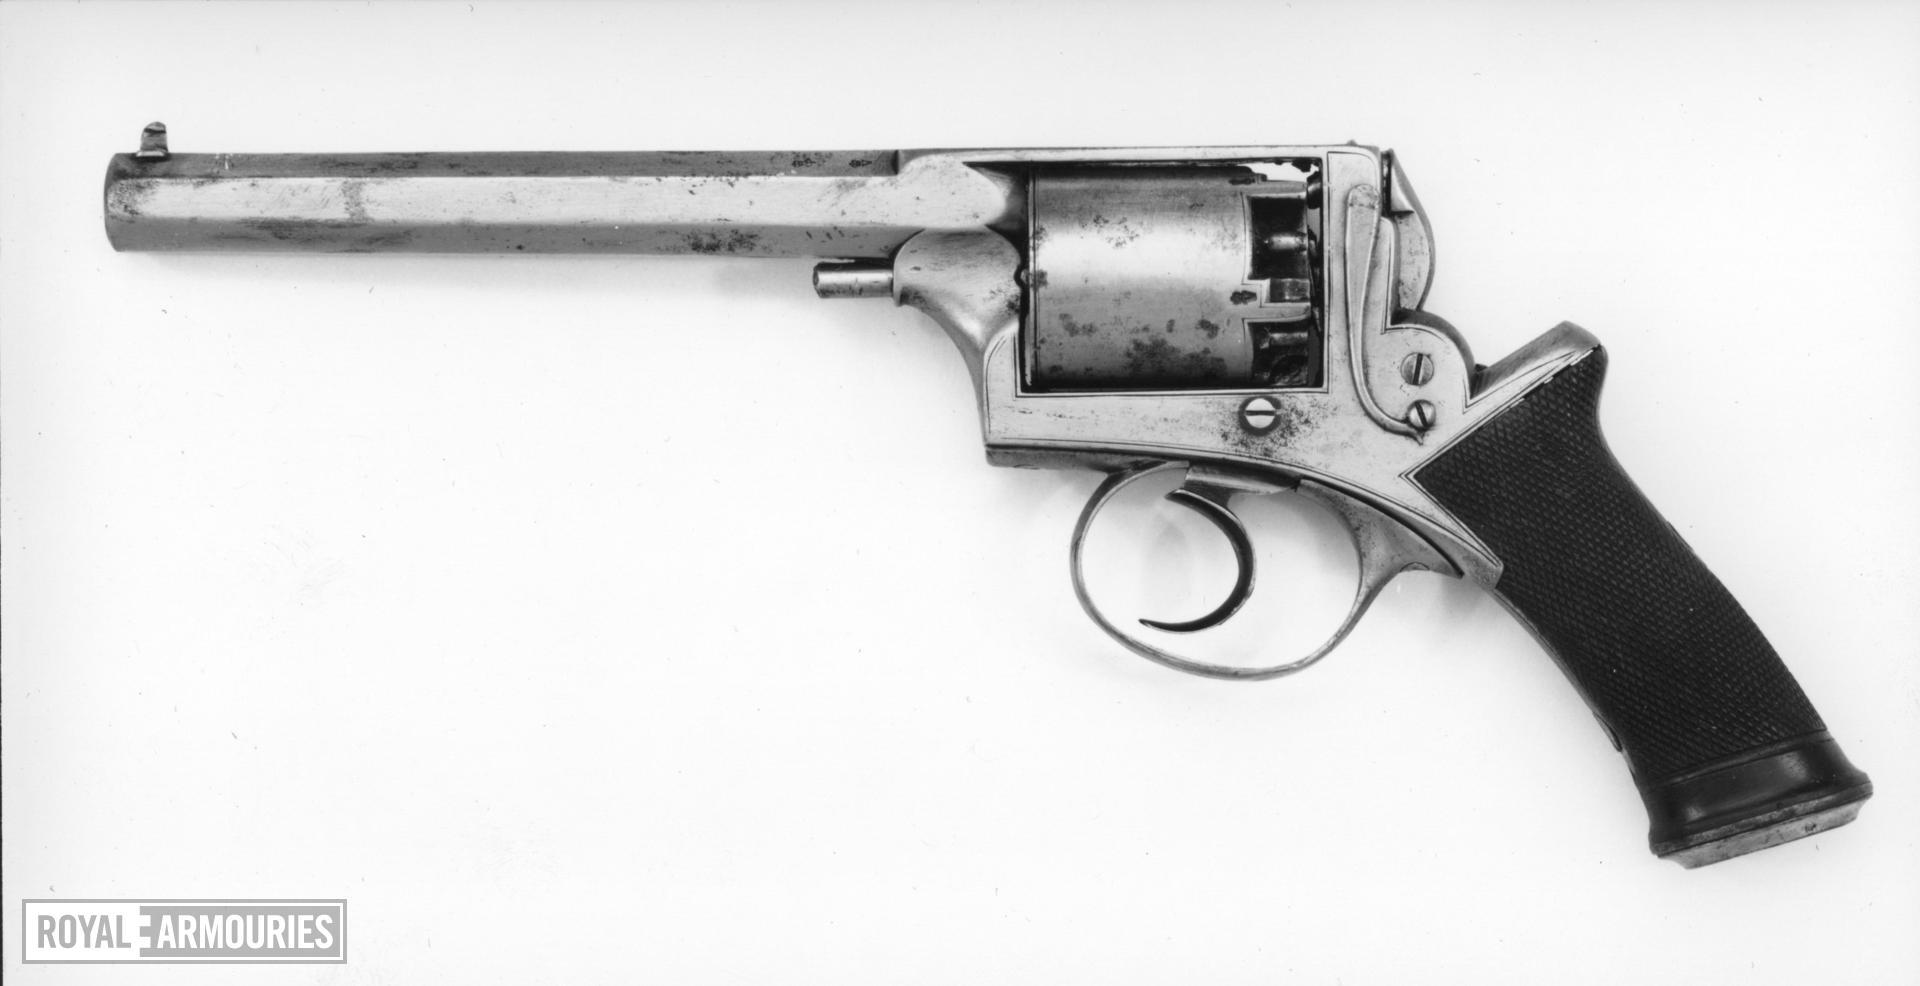 Percussion five-shot revolver - Deane Adams and Deane Model 1851